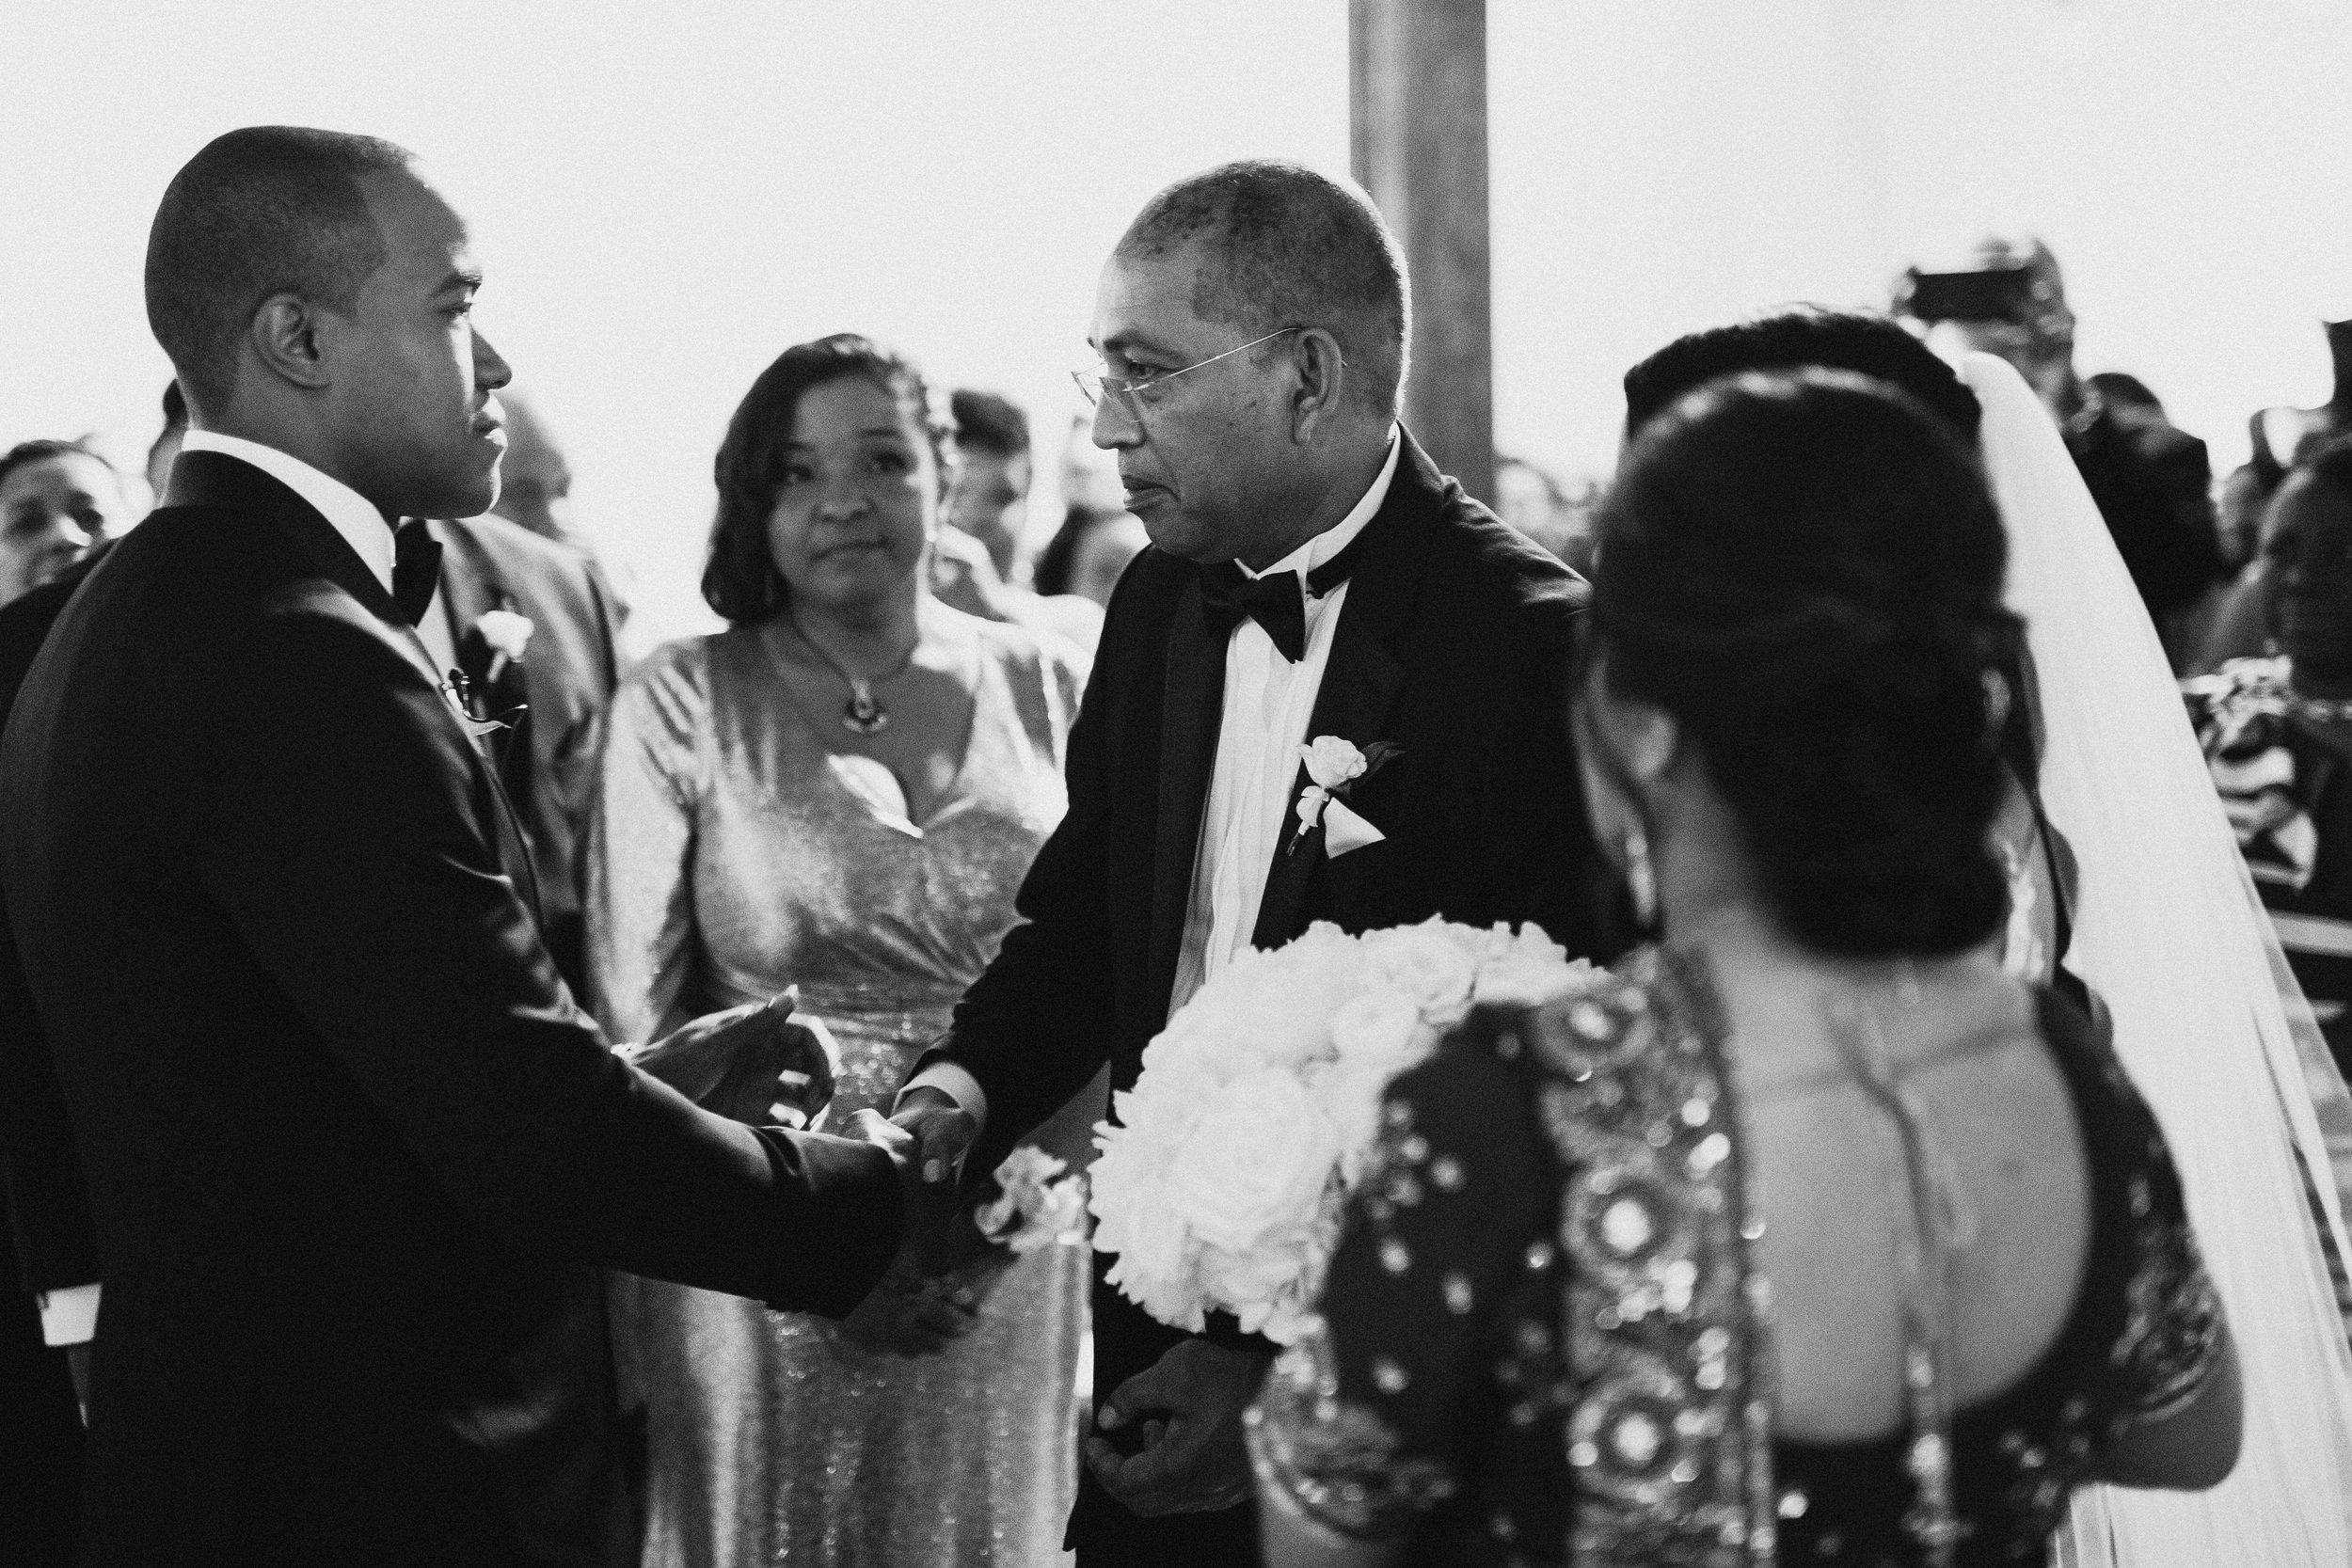 Mindy&Jared-wedding-by-LadiesAndGentlemen-by-Matija-Vuri-3365.jpg